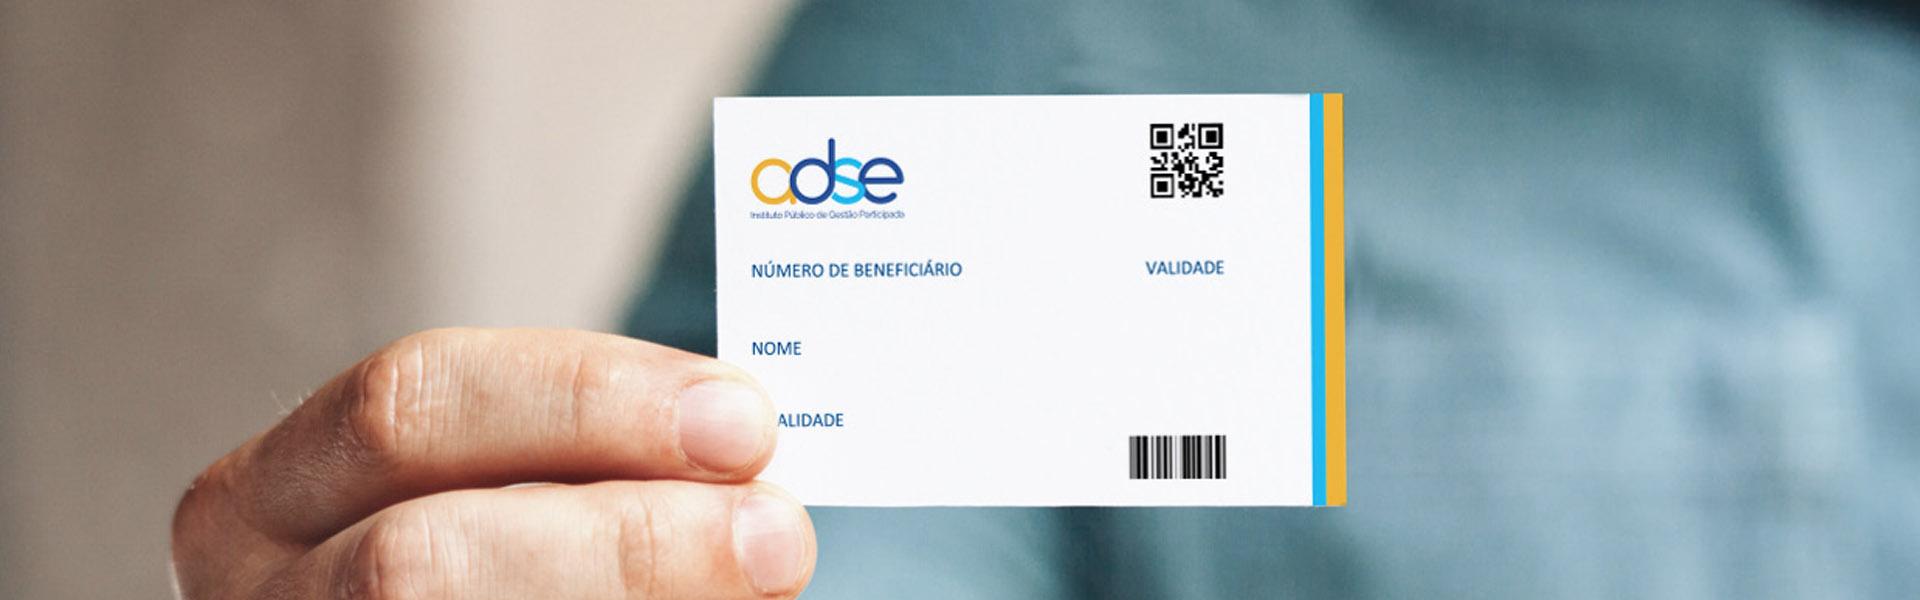 ADSE - Cartao de Beneficiario